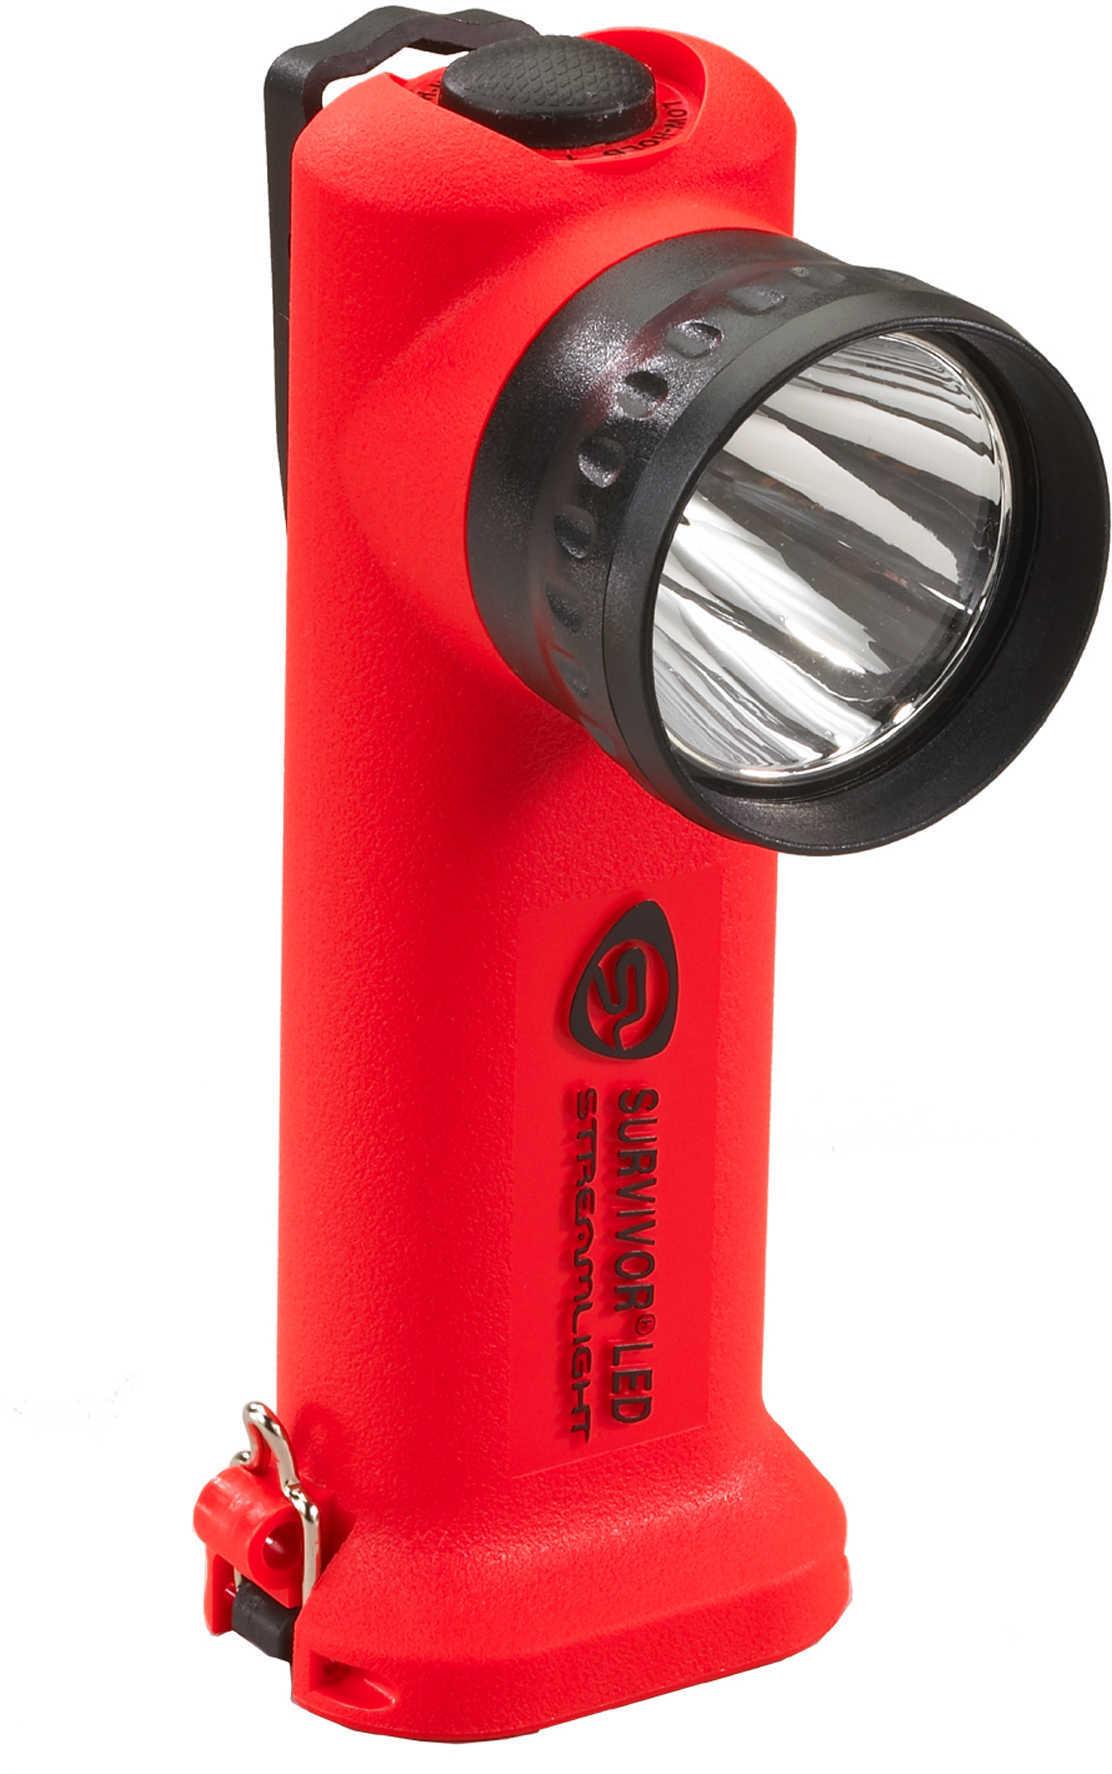 Streamlight Survivor Led Flashlight, Orange, Rechargeable Md: 90500